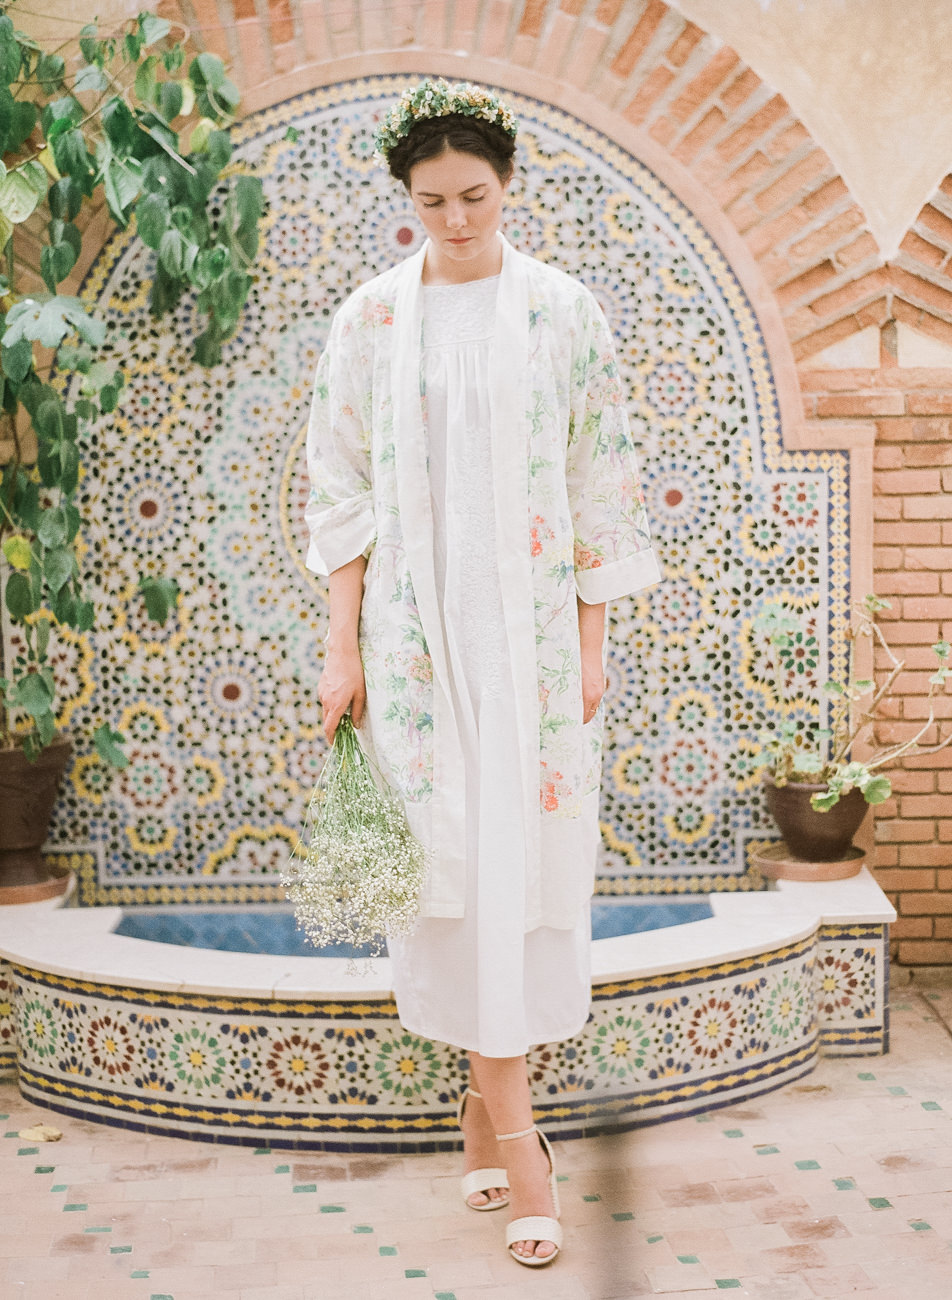 marrakech-photographe-mariage-alain-m-10.jpg